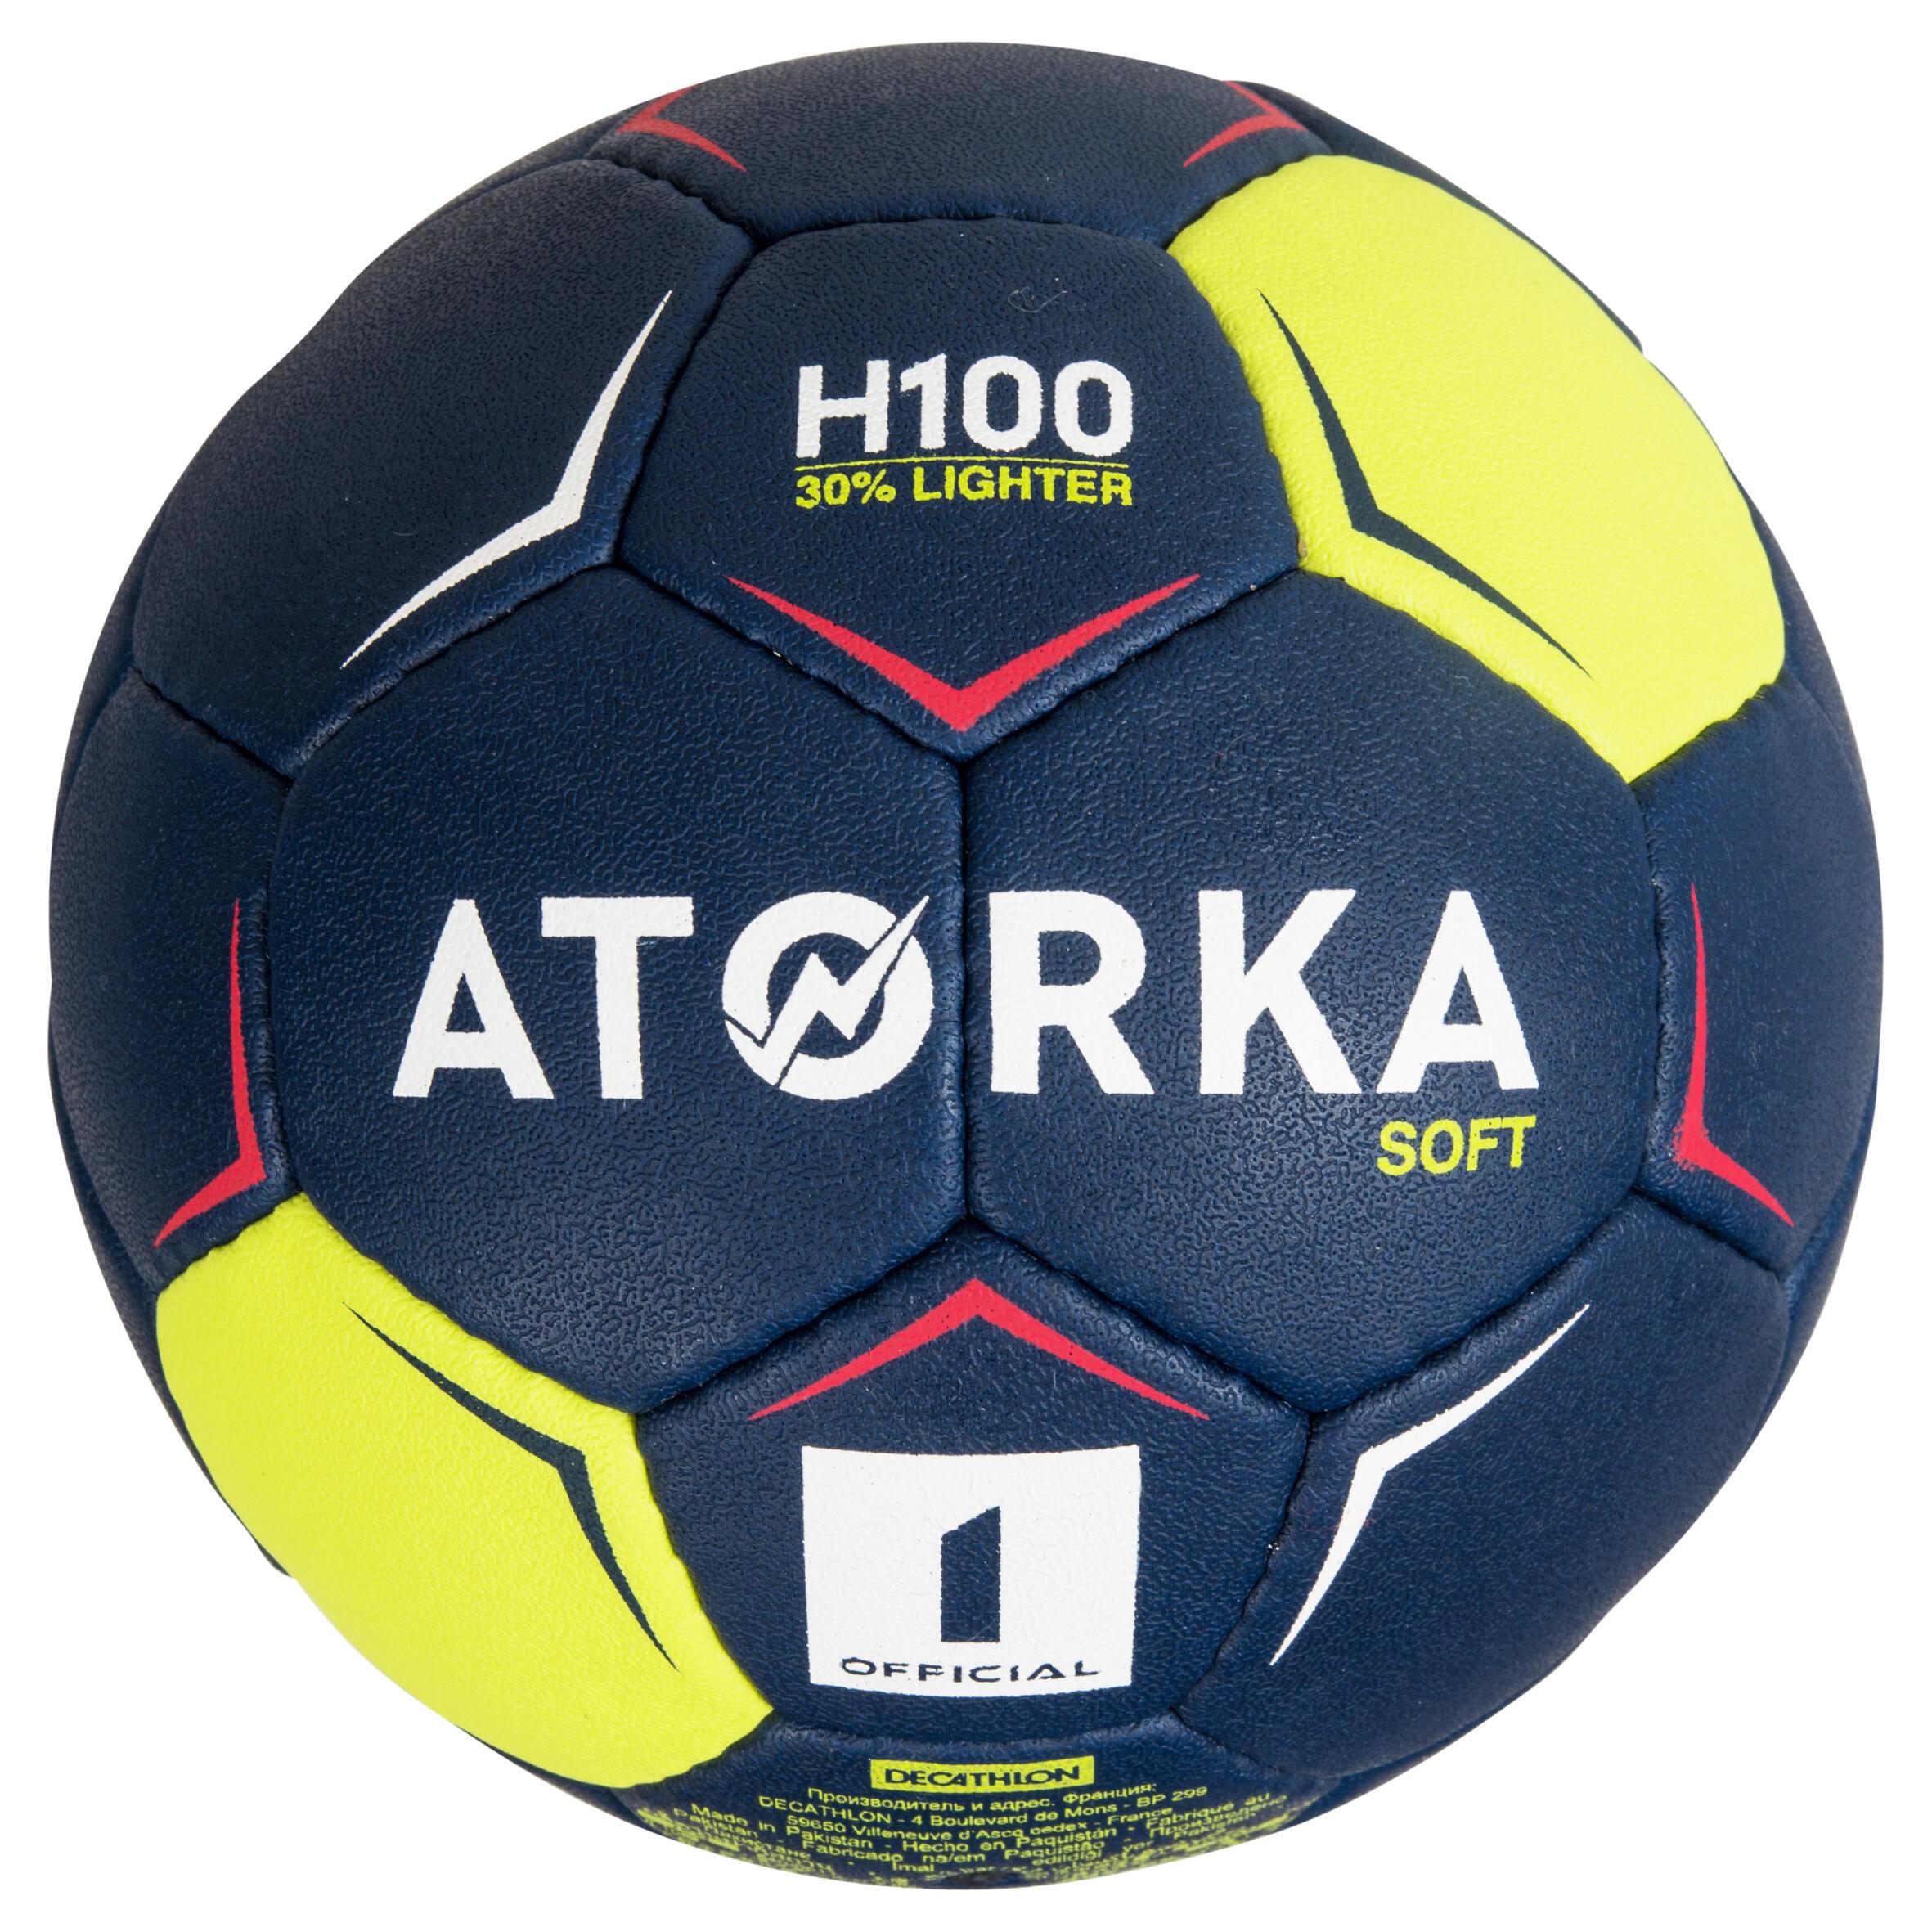 H100 Soft S1 Handball - Blue/Yellow